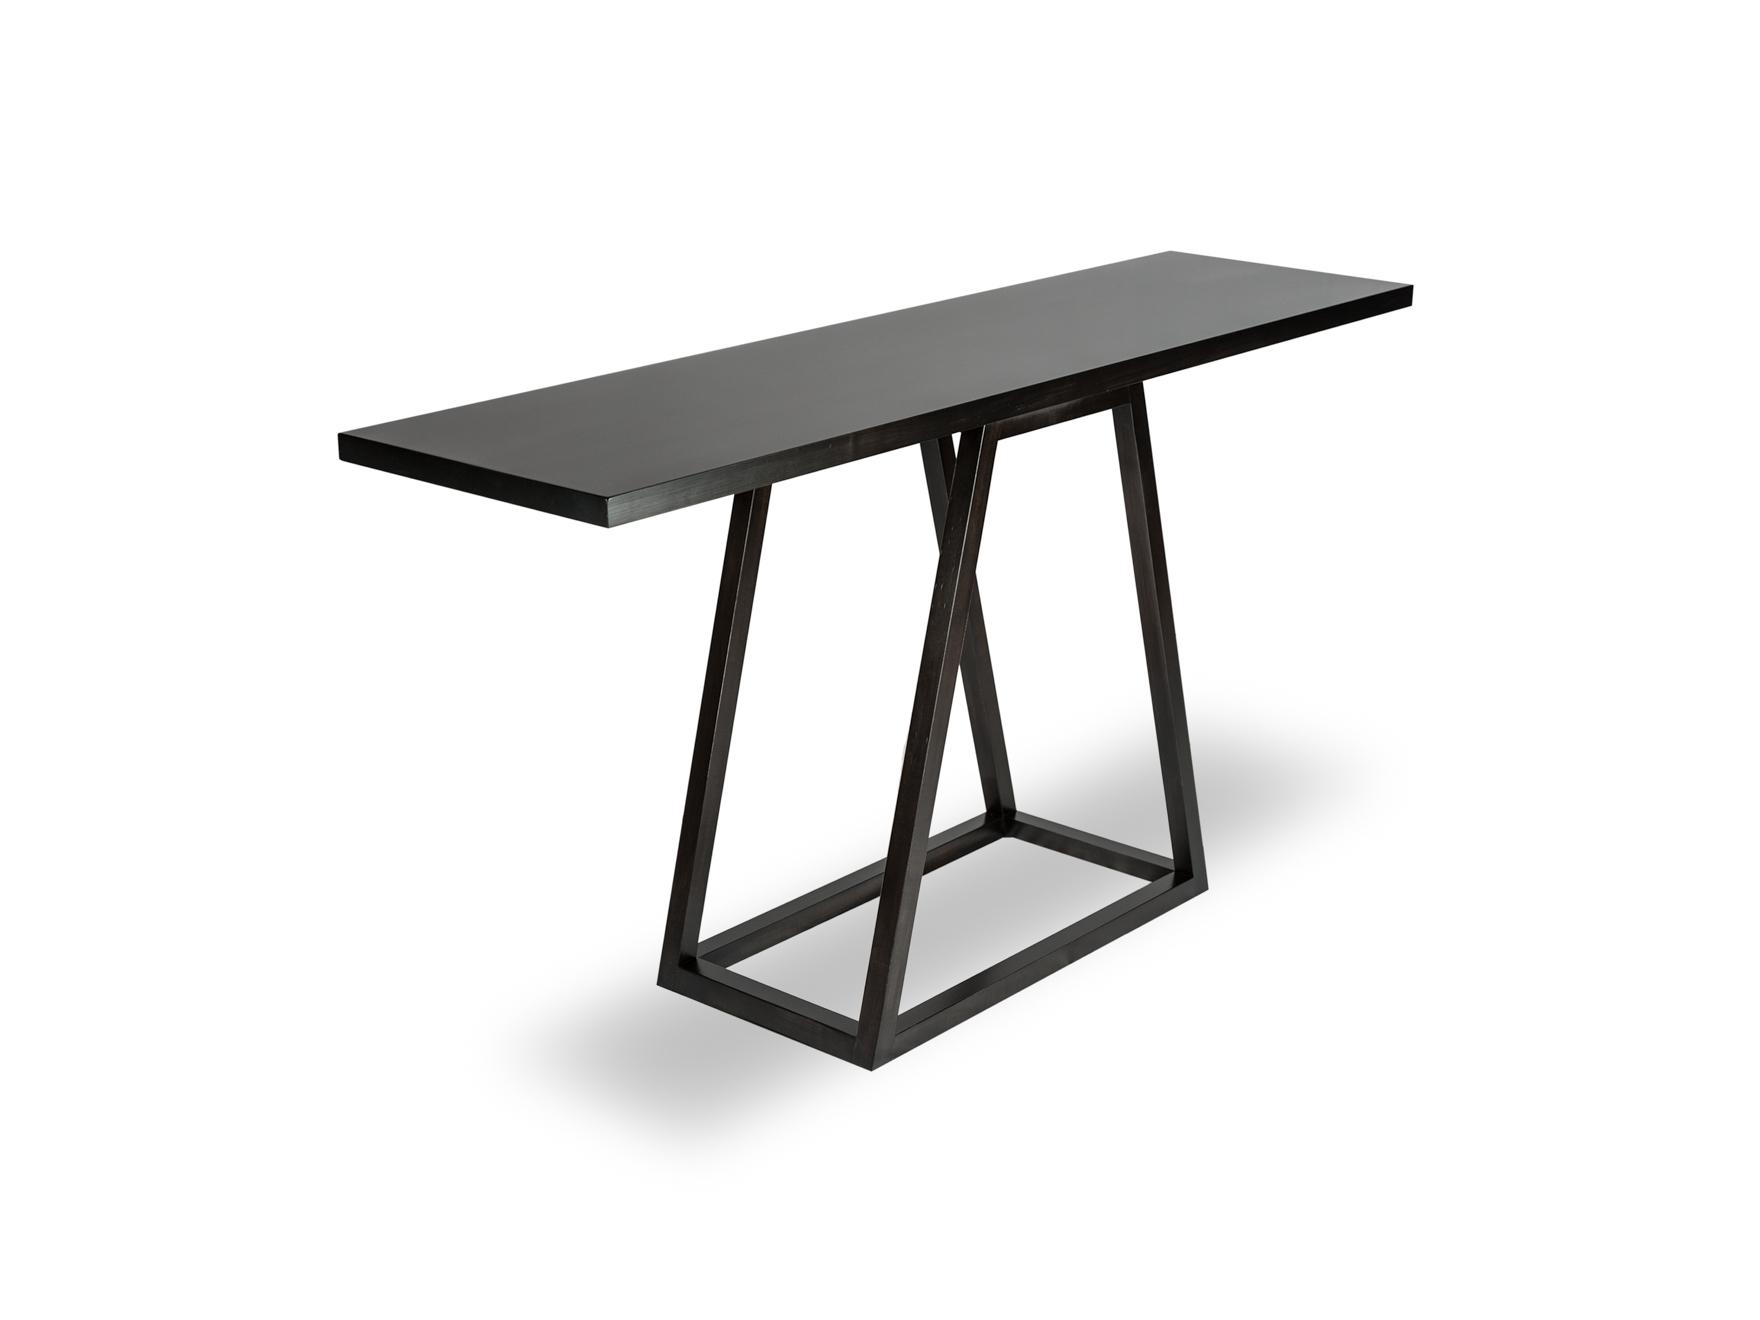 005_Woodcraft_Furniture_AvenueSofaTable_QtrB.jpg